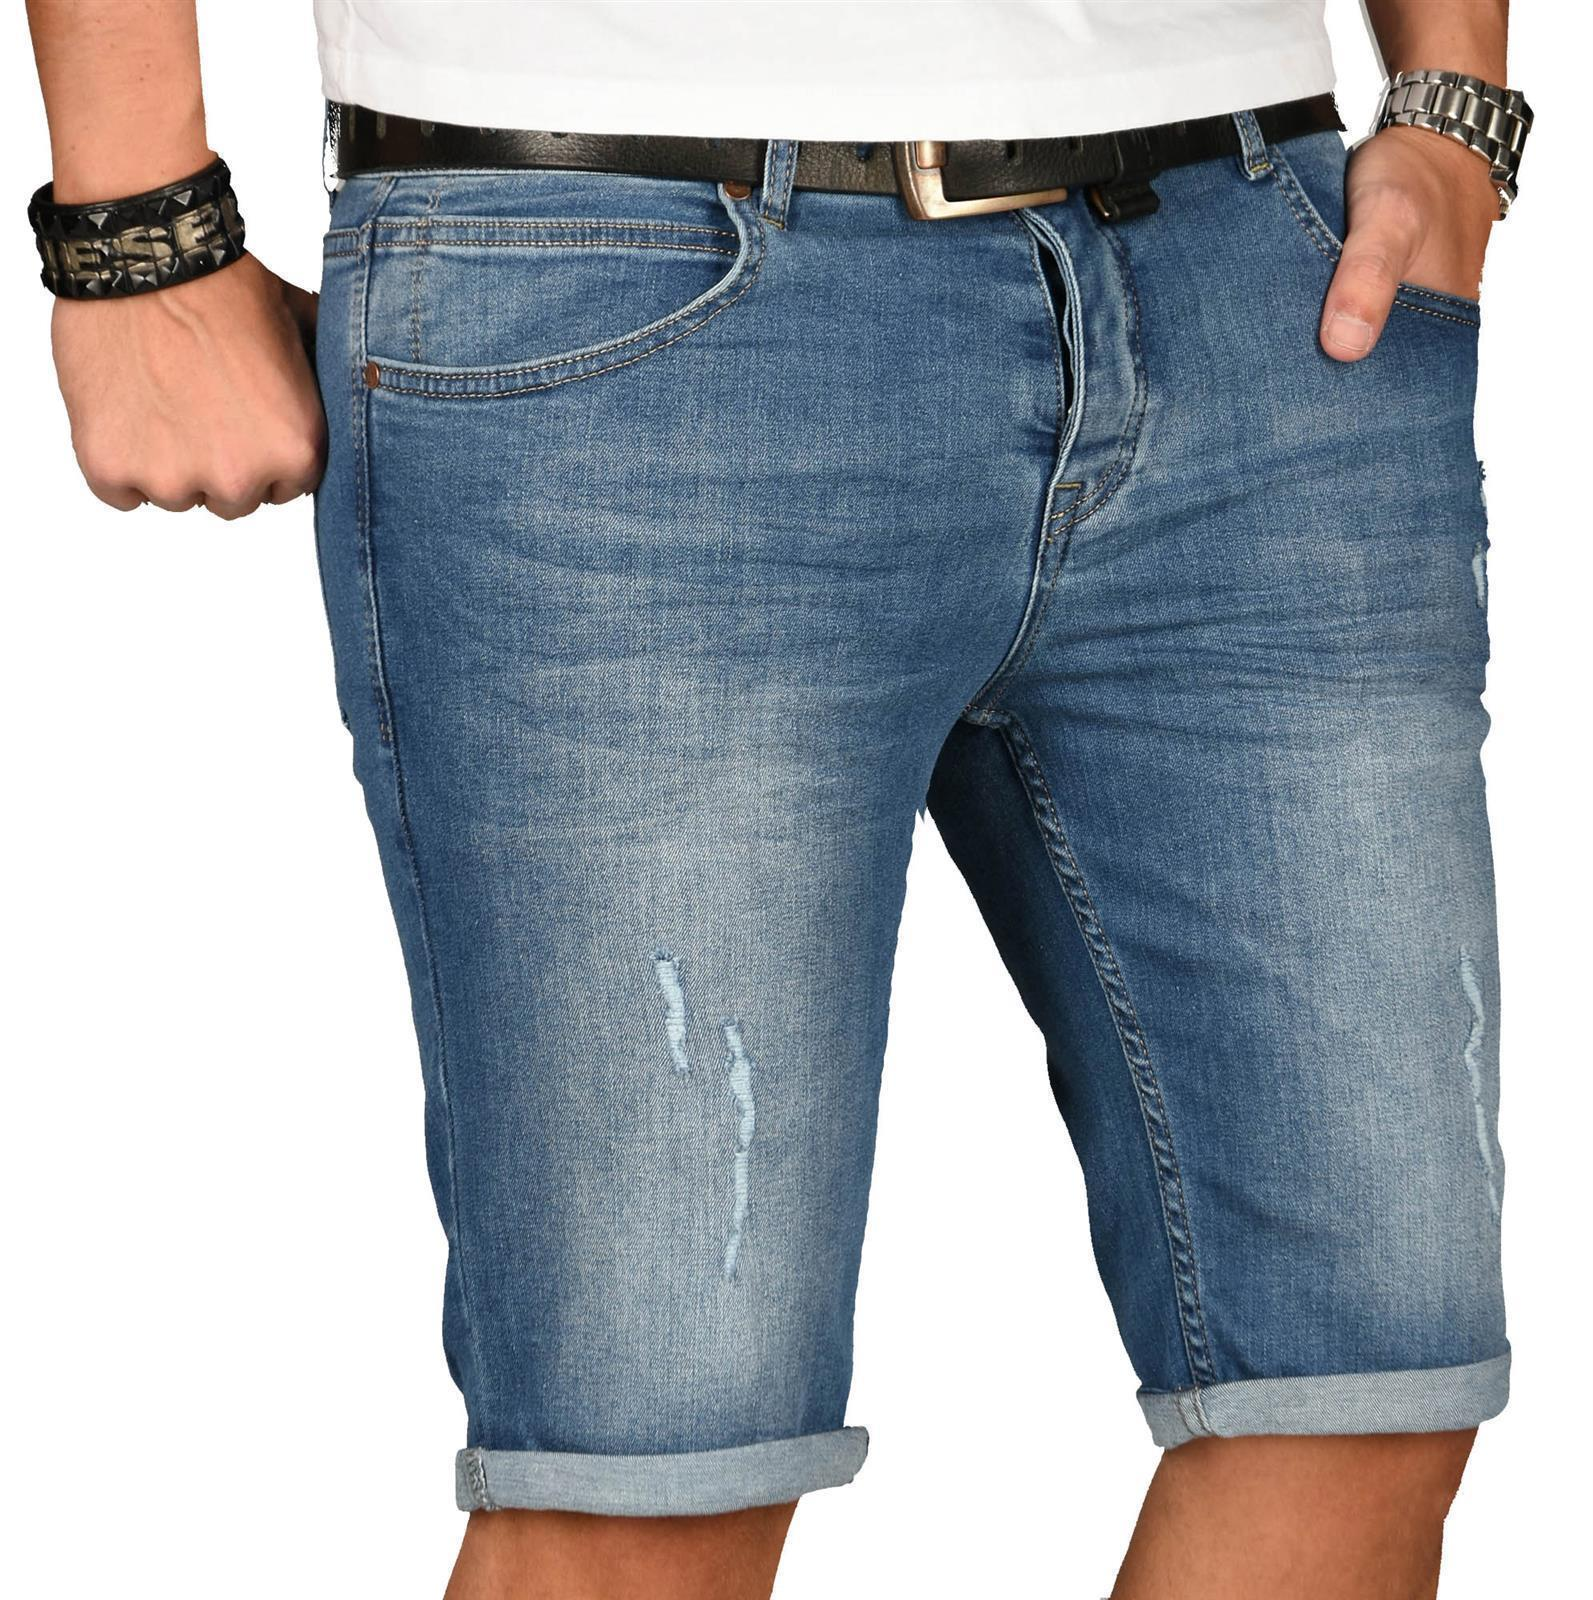 A-Salvarini-Herren-Designer-Jeans-Short-kurze-Hose-Slim-Sommer-Shorts-Washed Indexbild 27